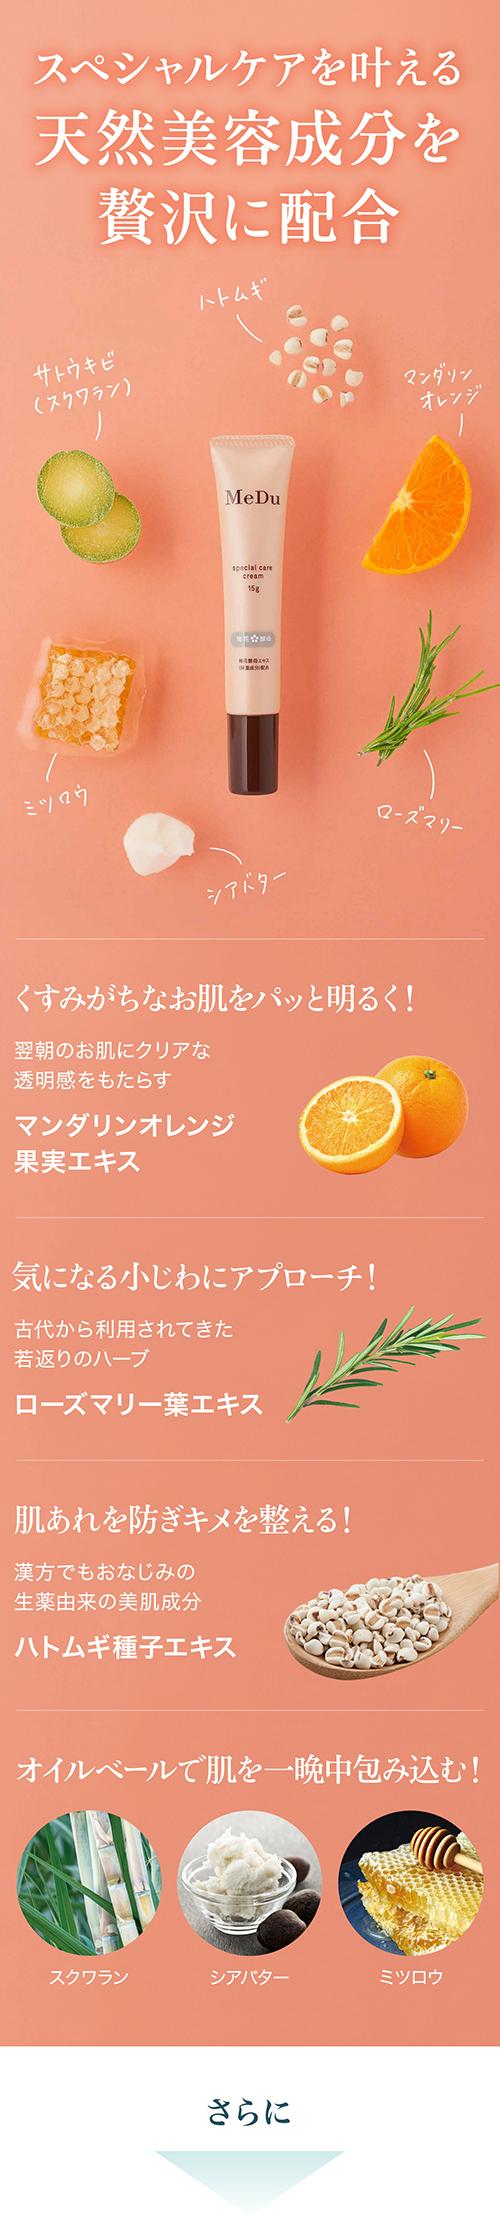 MeDu_store_online_w500_specialcare_09b.jpg